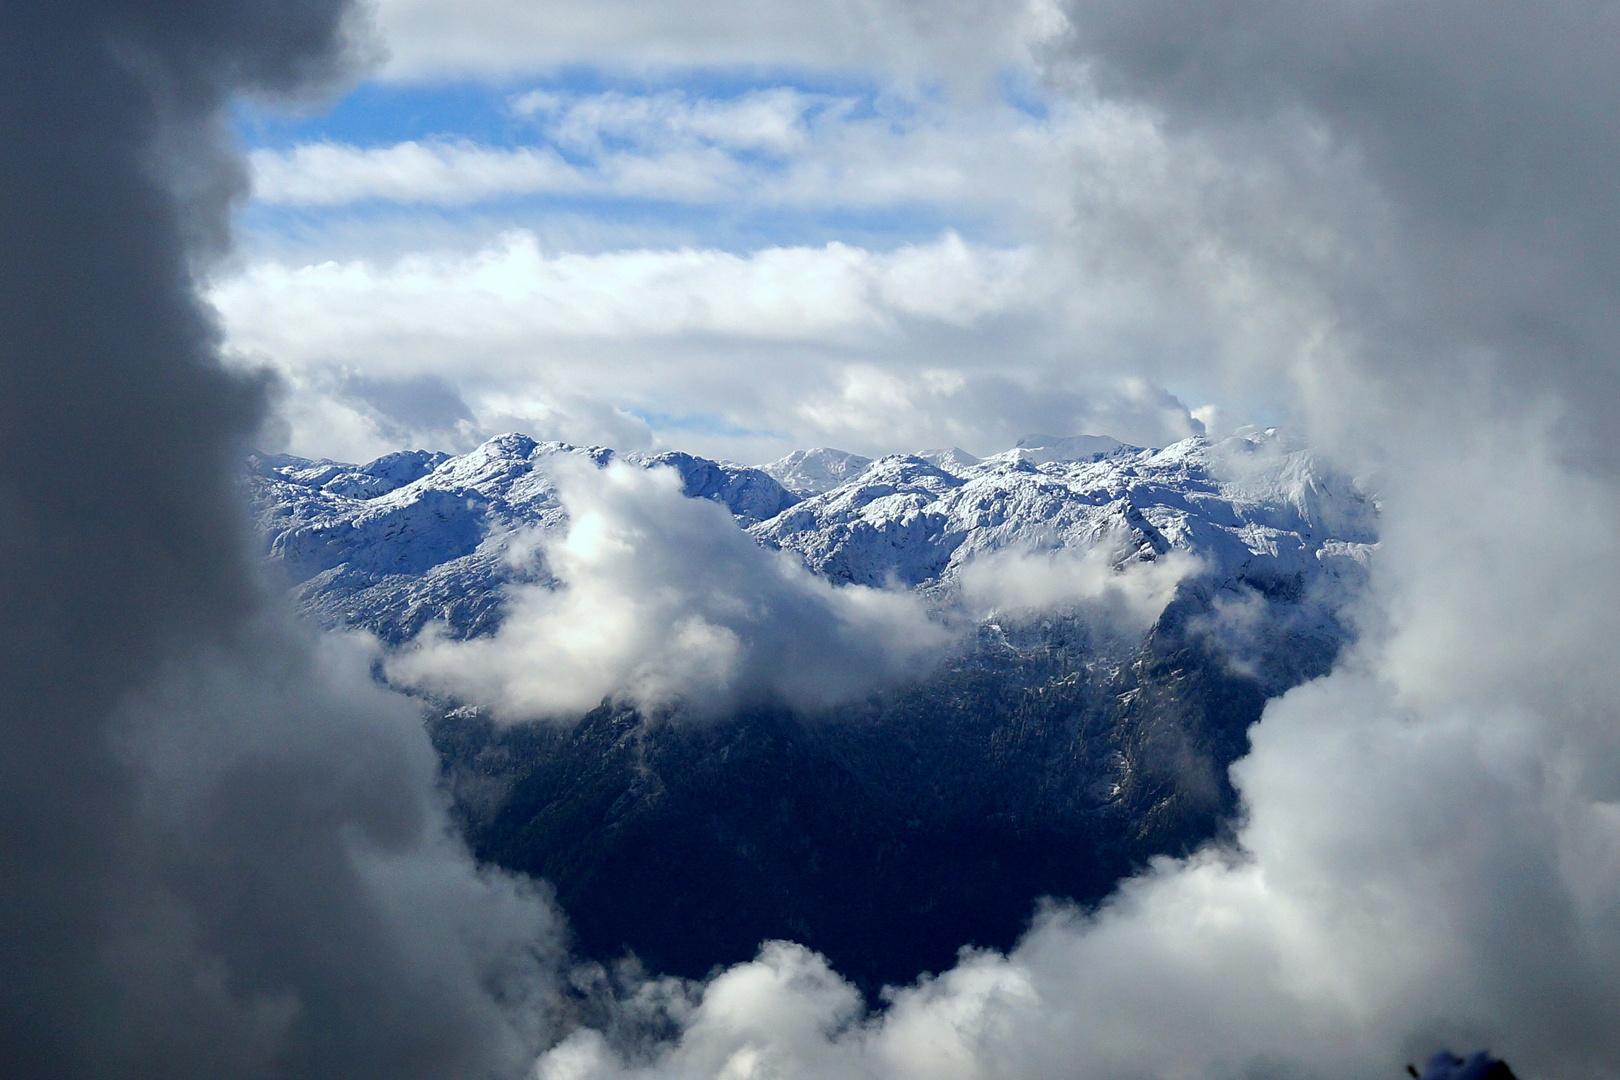 Bergblicke ohne Photoshop,,,,[ Archivebild )